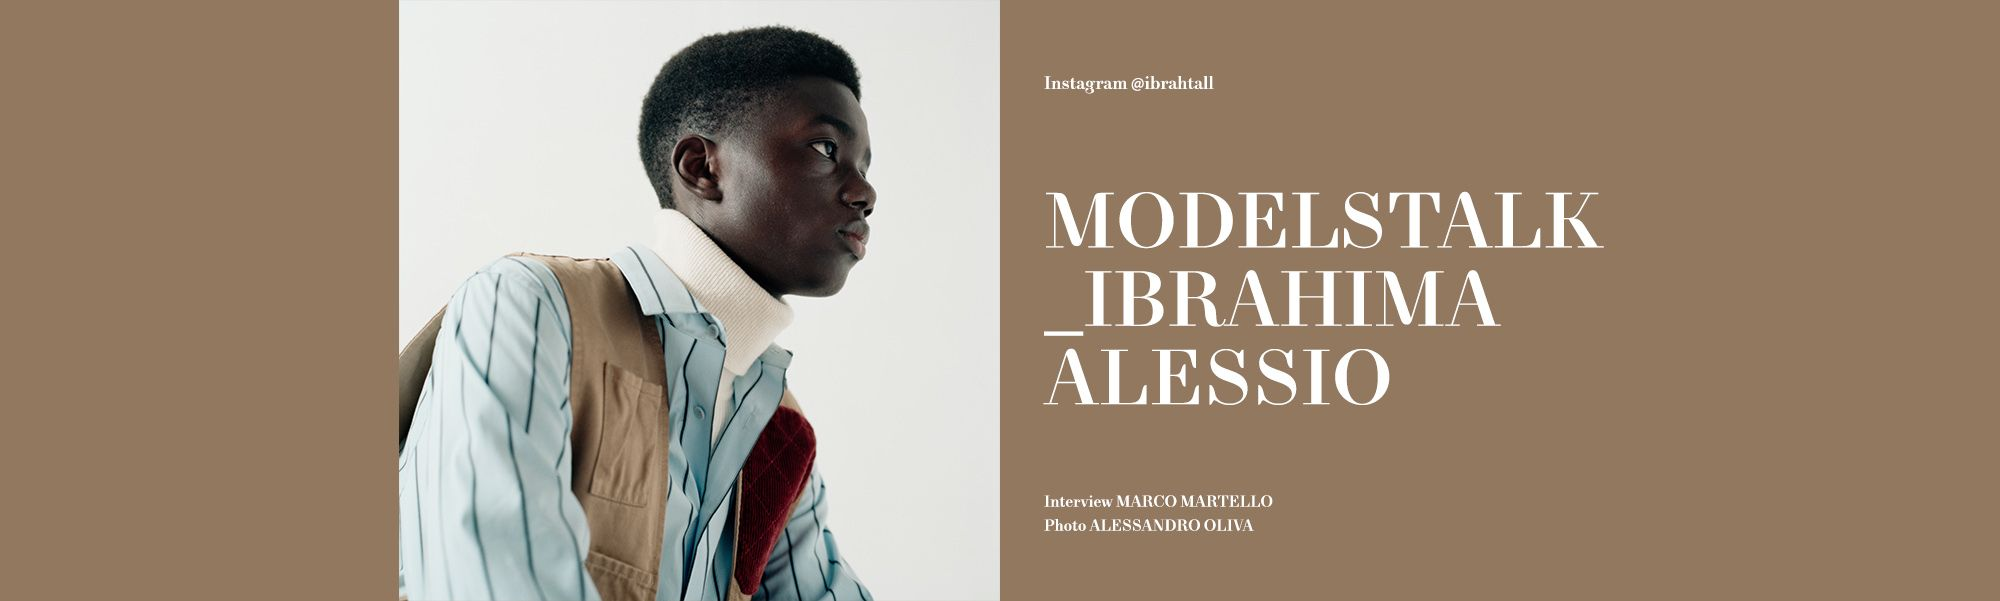 thegreatestmagazine-ibrahima-alessio-banner